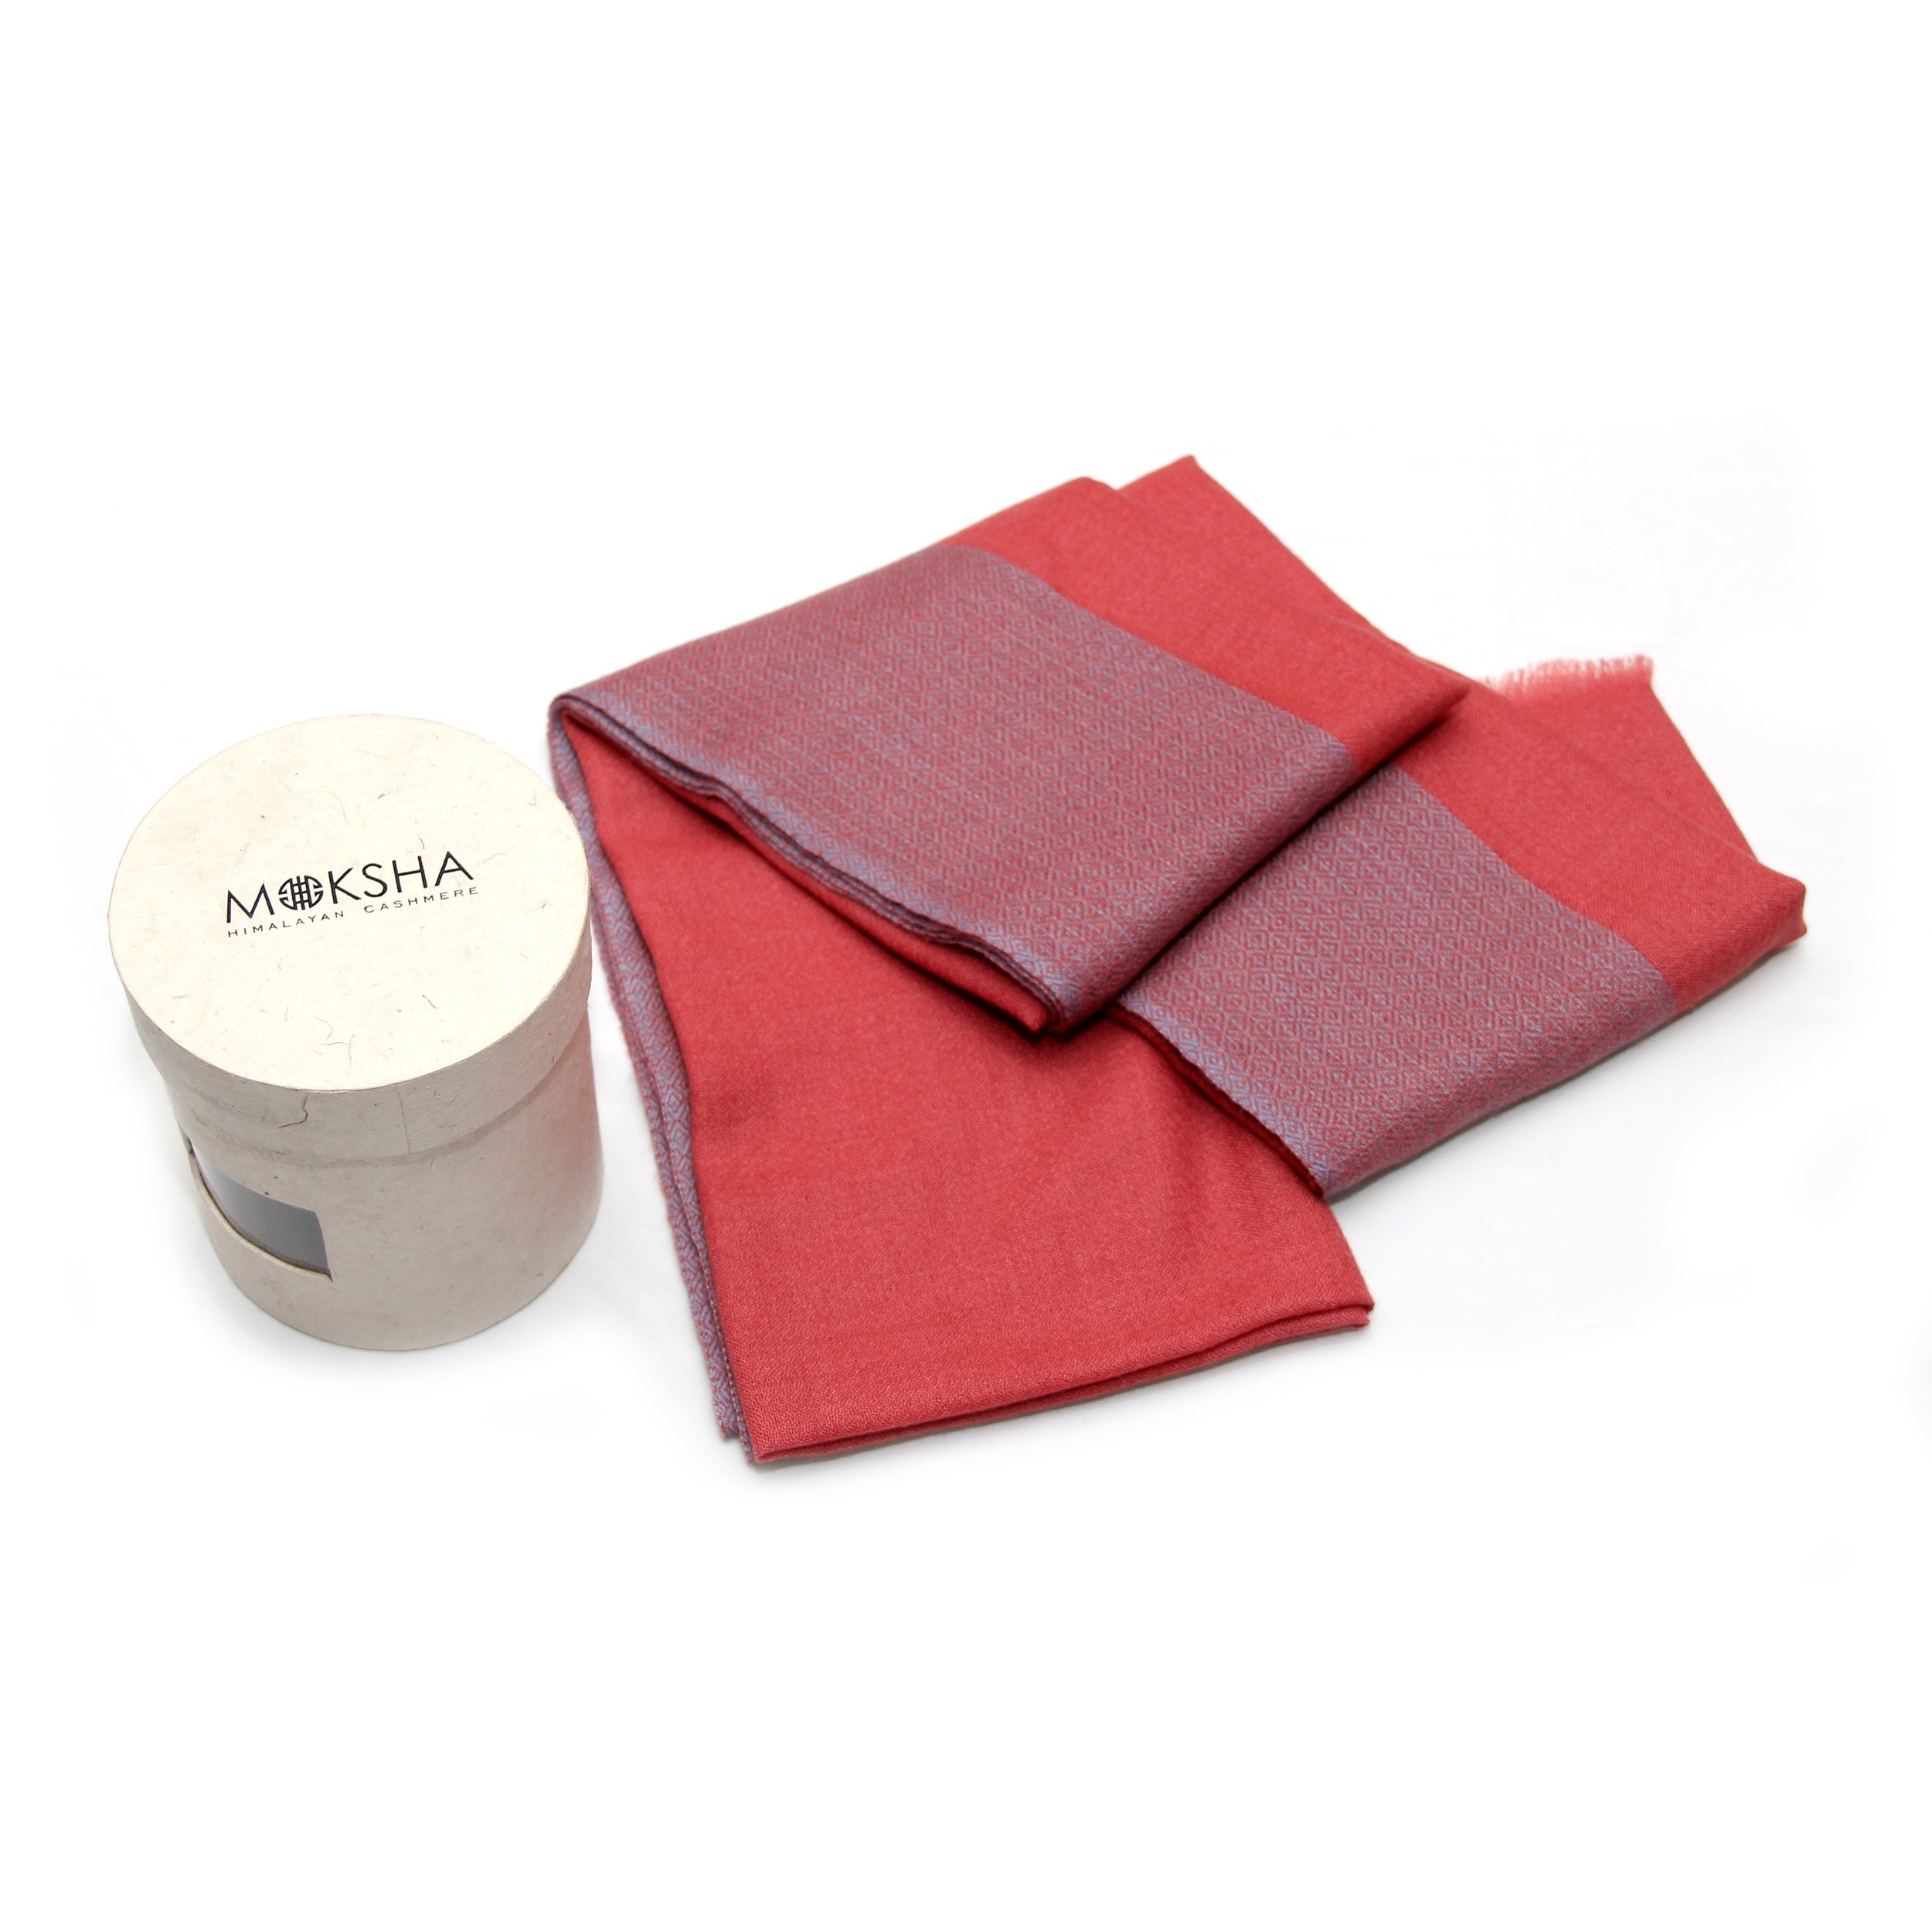 100% Cashmere Stole Lightweight, Diamond-Woven Pattern, Mongolian Cashmere (100/2 Yarn Composition) , Pink © Moksha Cashmere